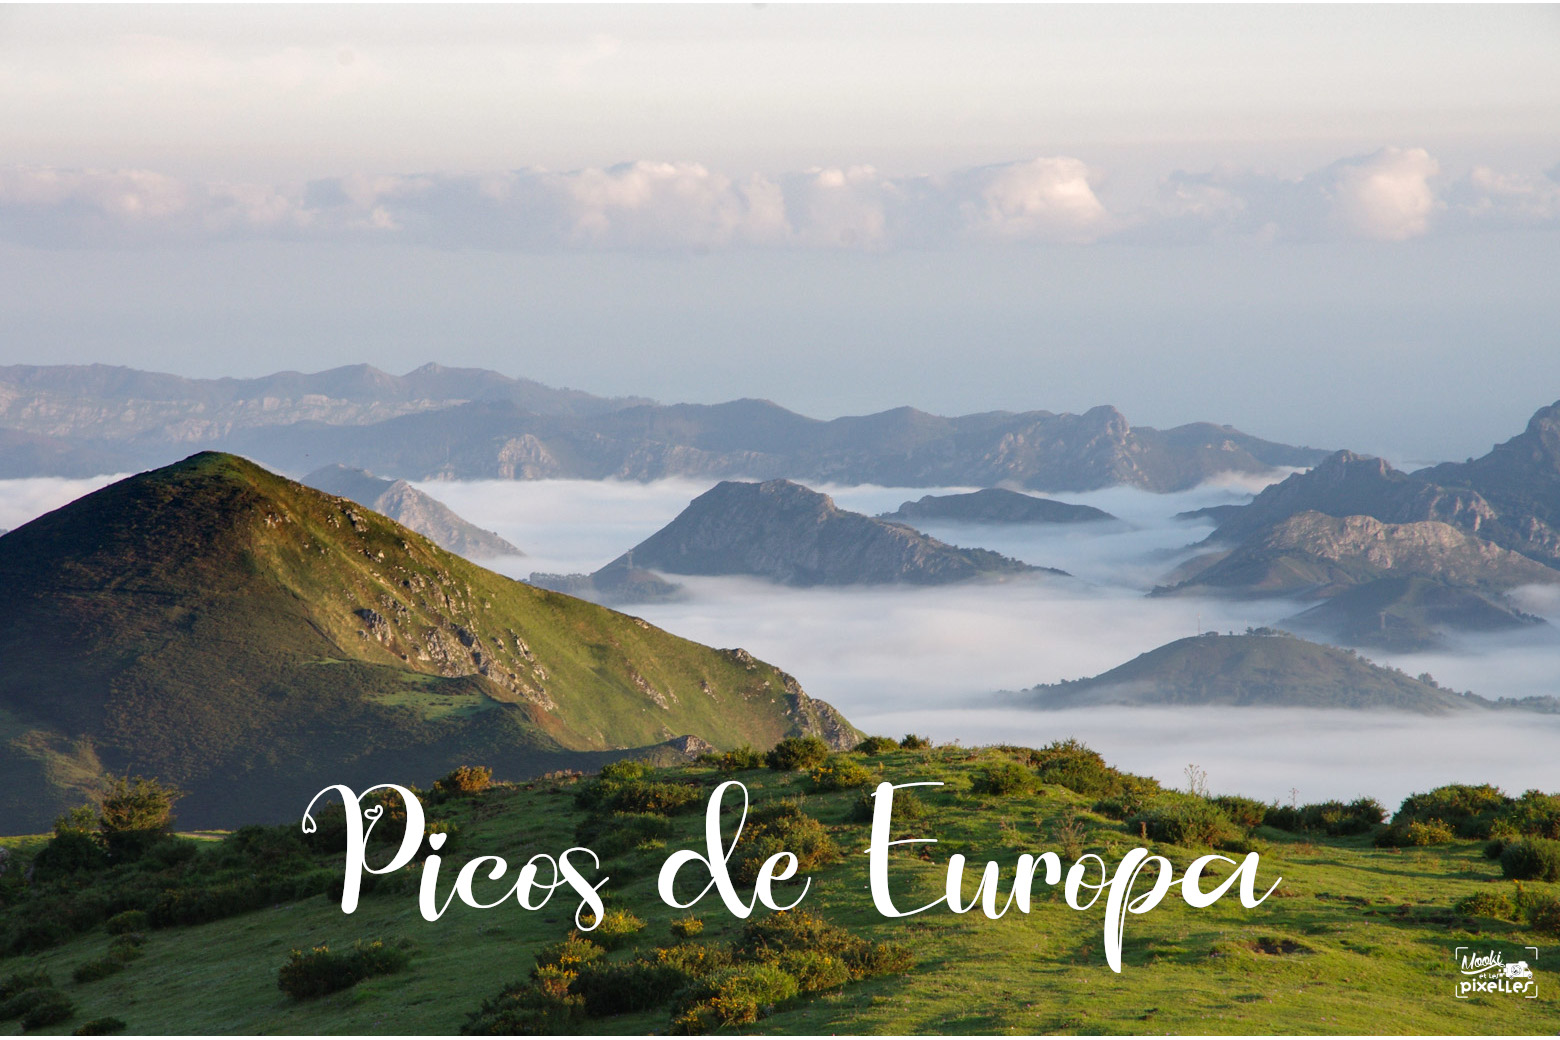 Mer de nuage sur les Picos de Europa en Espagne